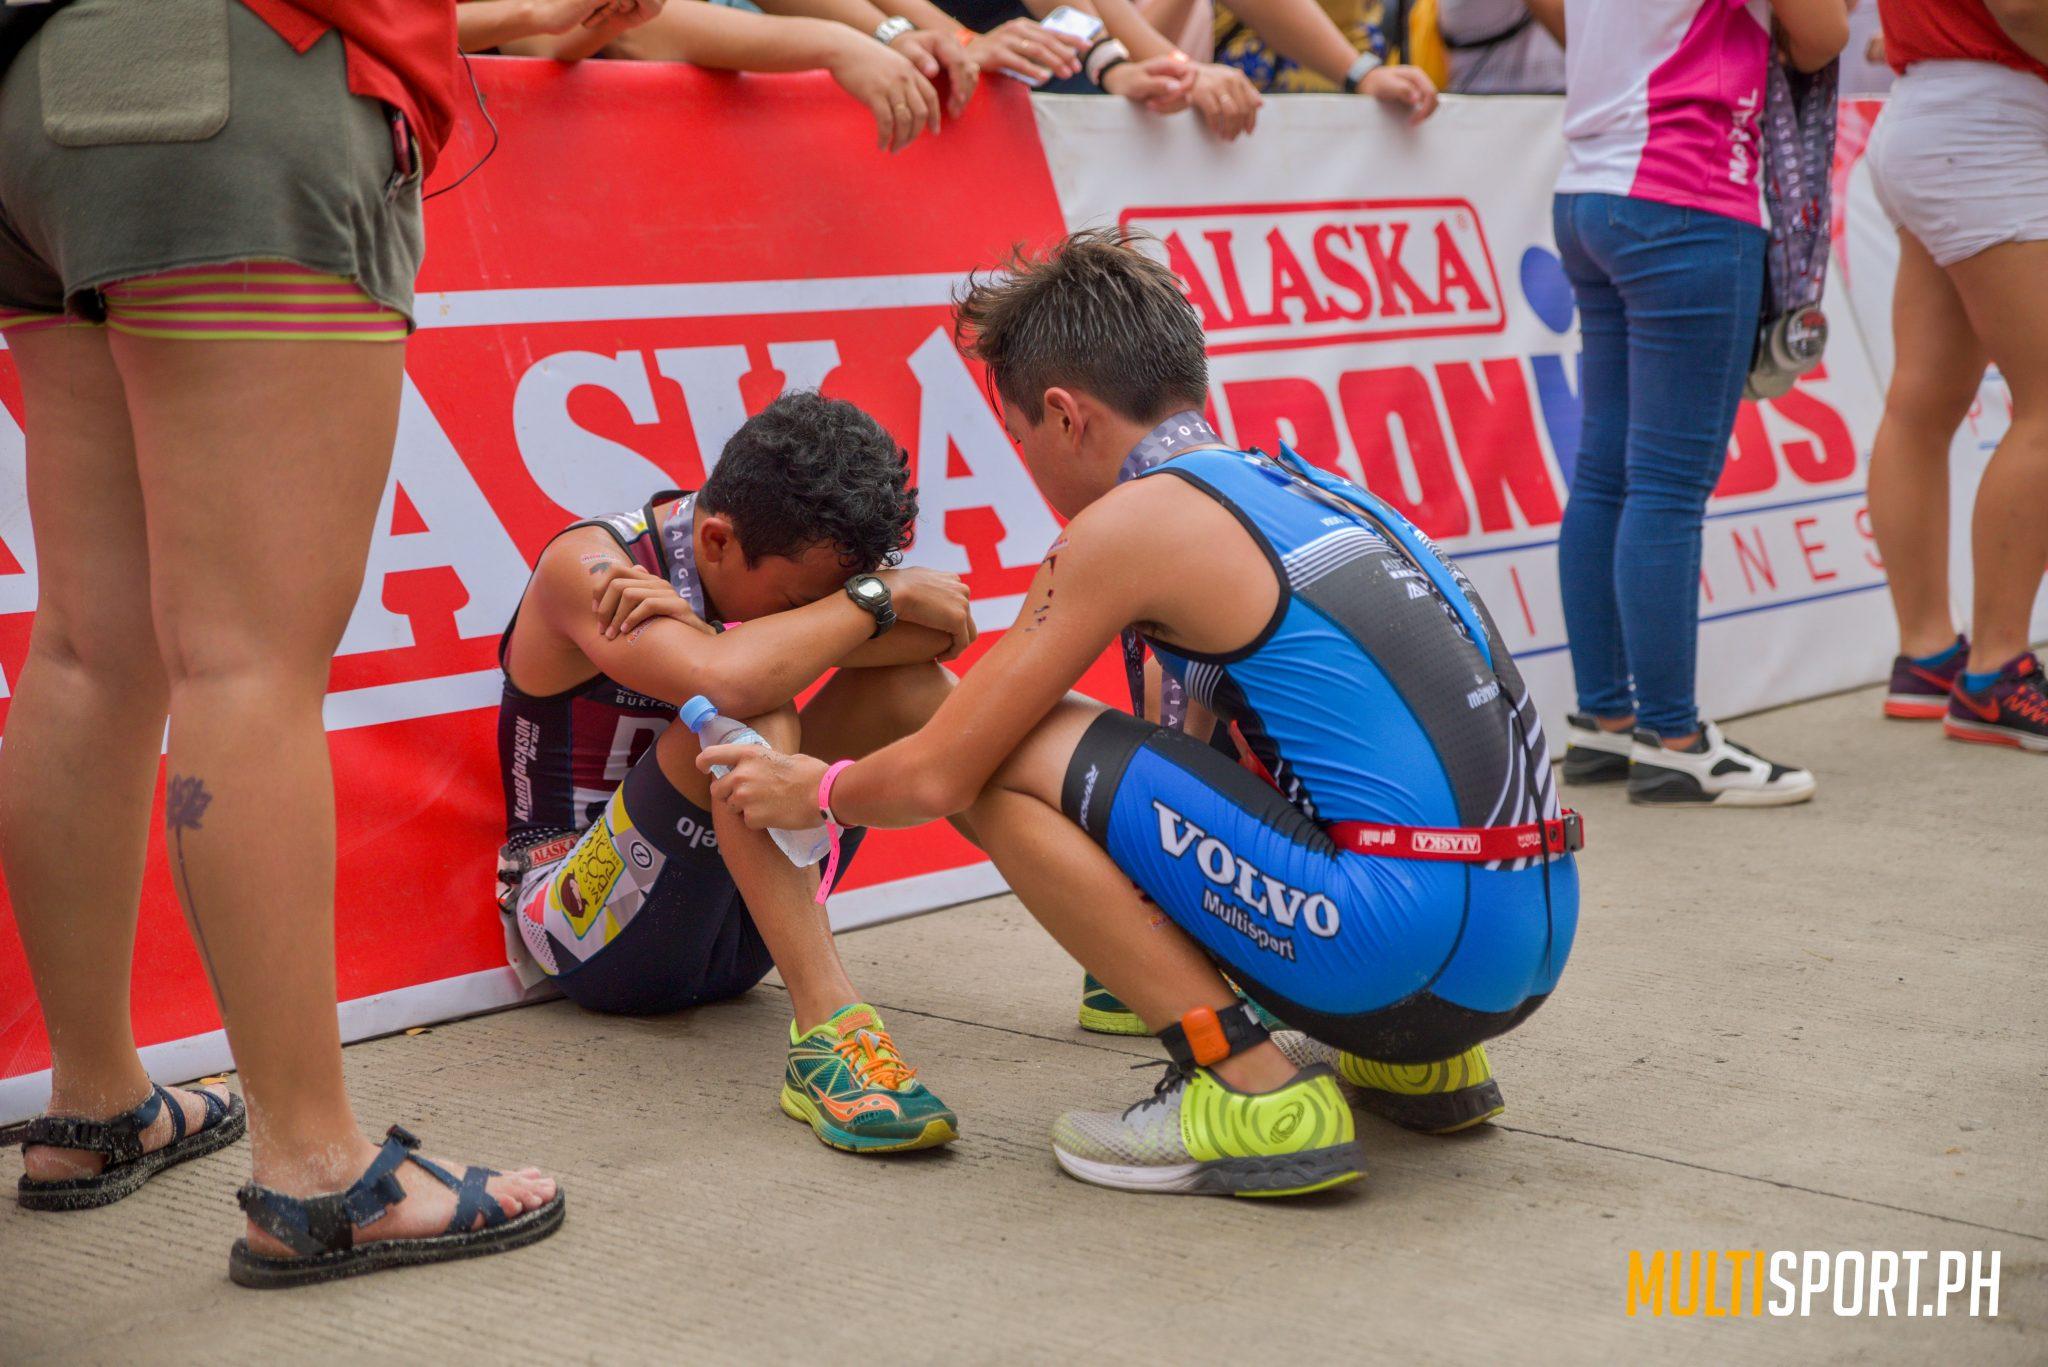 Gallery: Regent Aguila Ironman 70.3 Alaska Iron Kids 2018